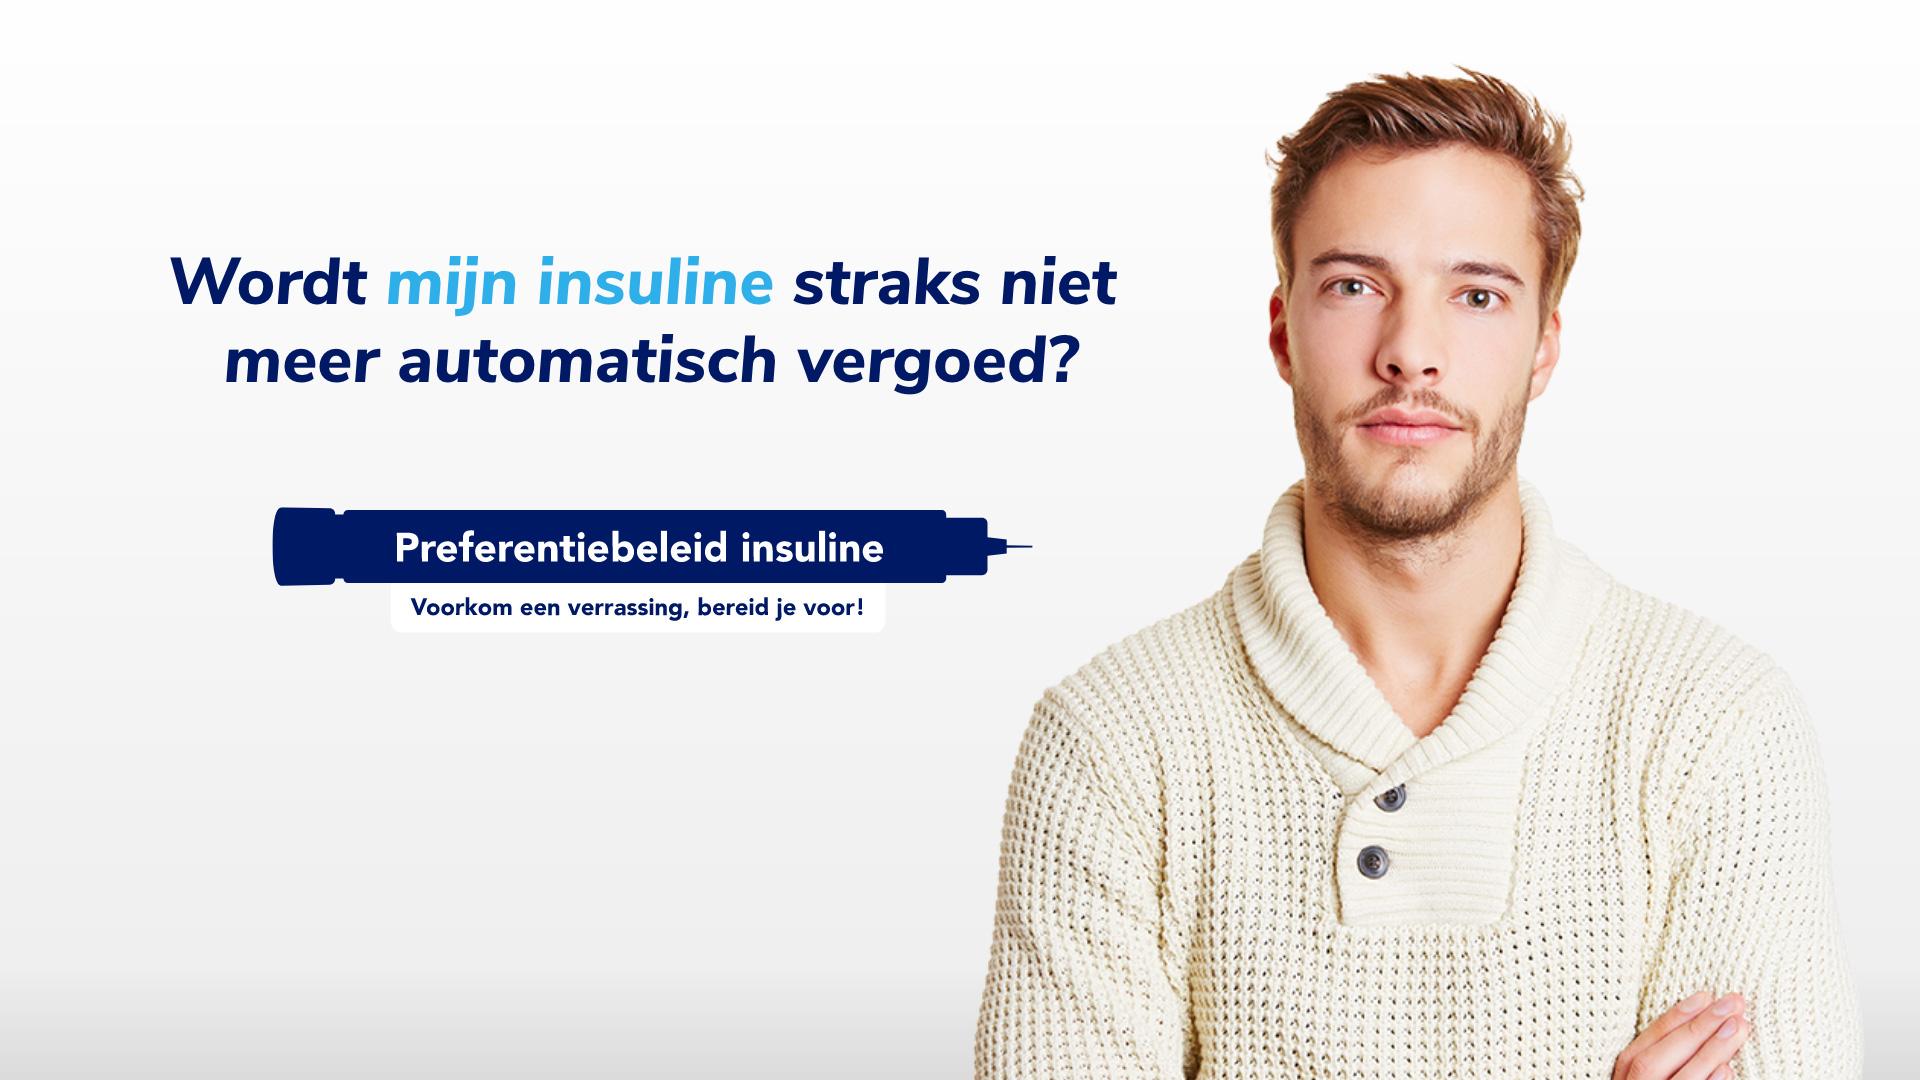 Novo Nordisk – Preferentiebeleid insuline